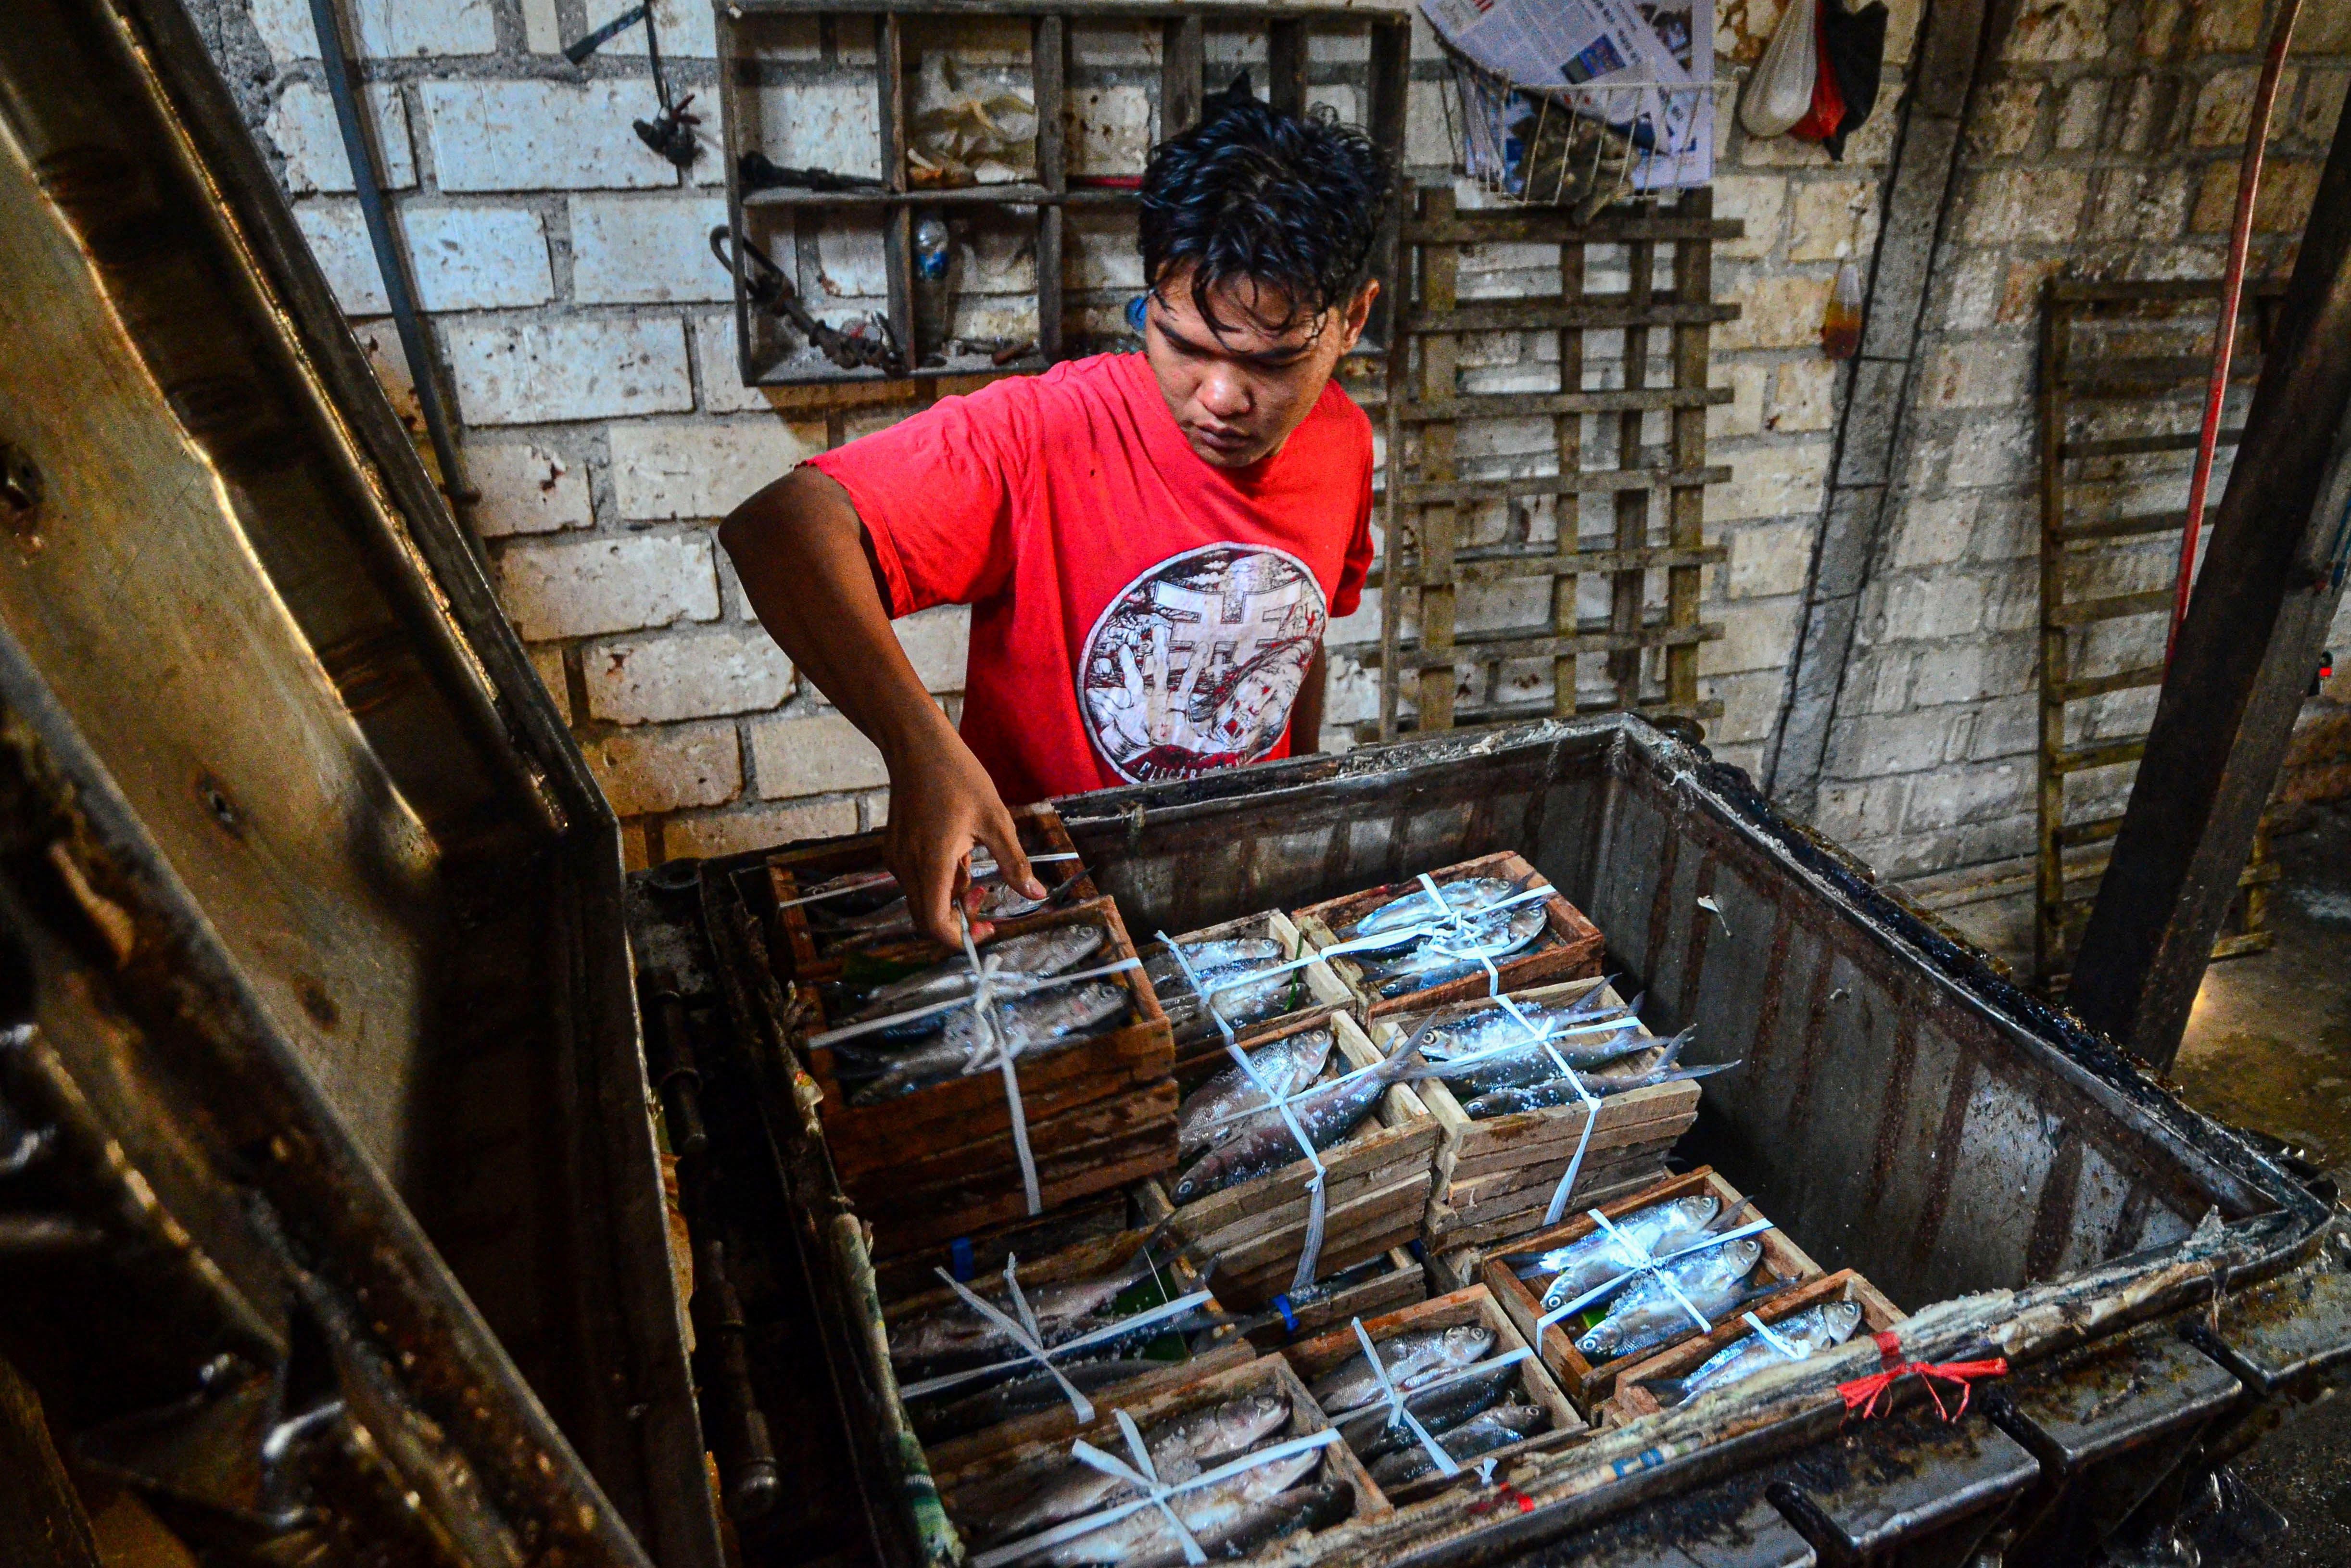 Pekerja memasukkan ikan bandeng ke dalam panci presto di Desa Dukutalit, Juwana, Pati, Jawa Tengah.\r\n